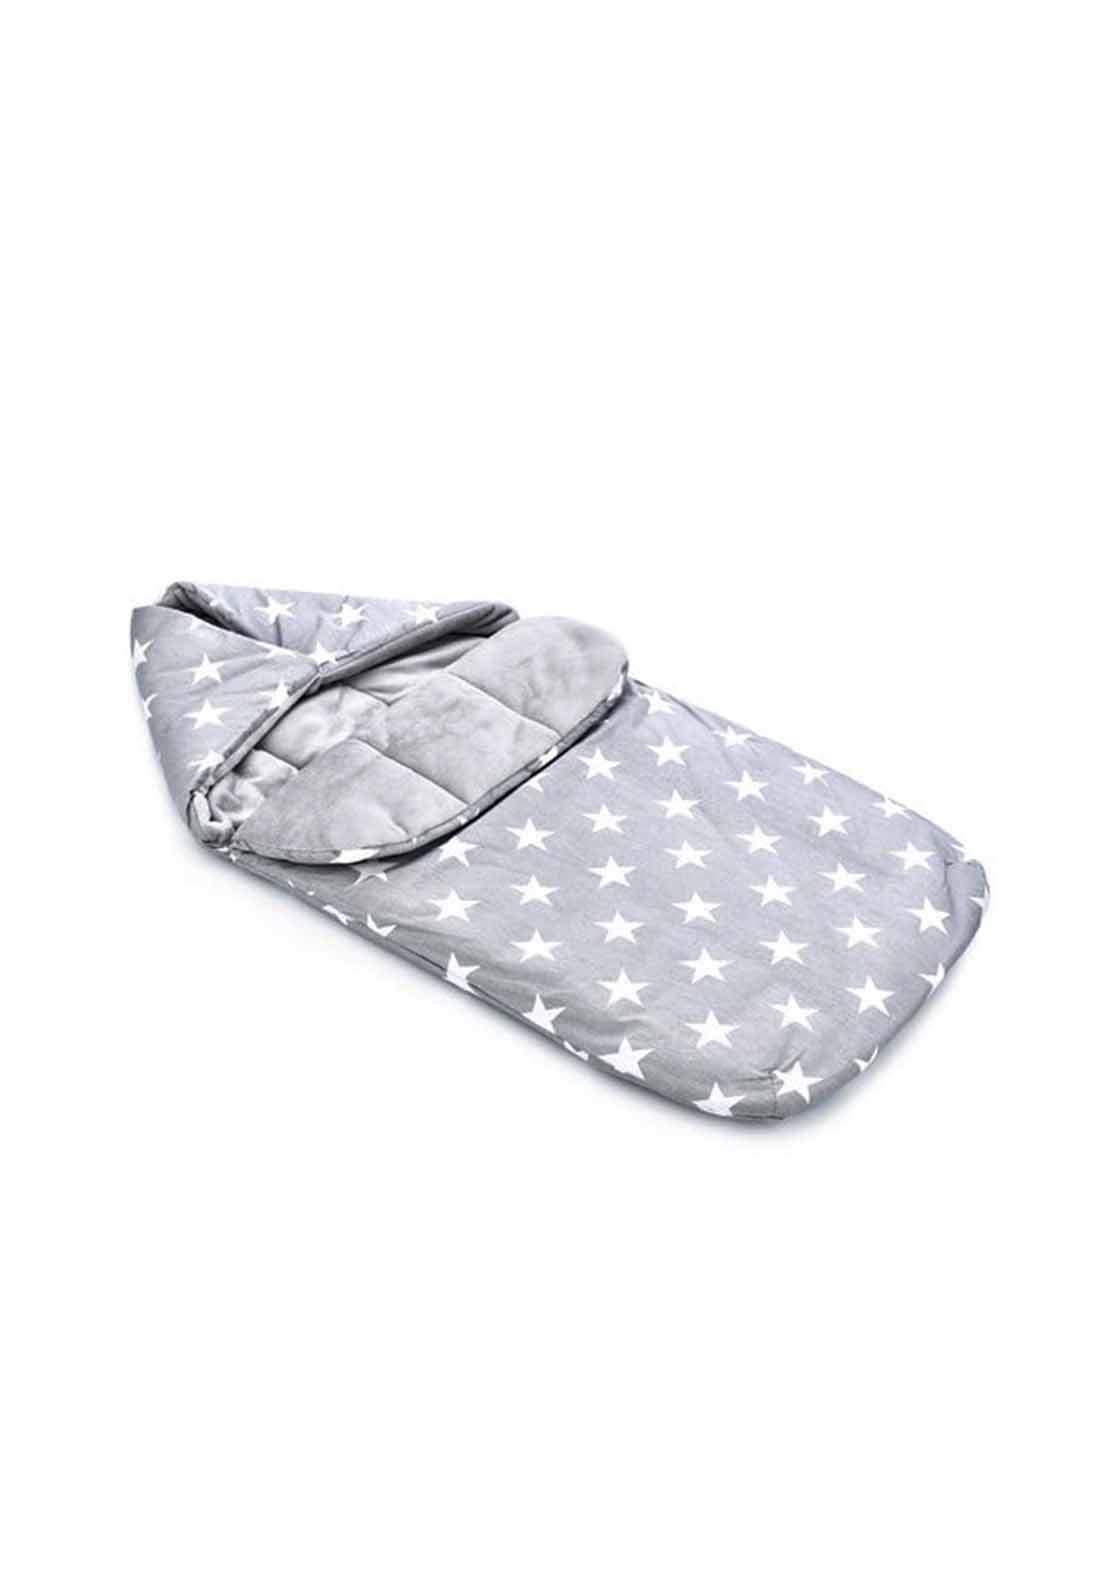 Babyjem 428j Baby Quilt Sleeping Bag عش الطفل